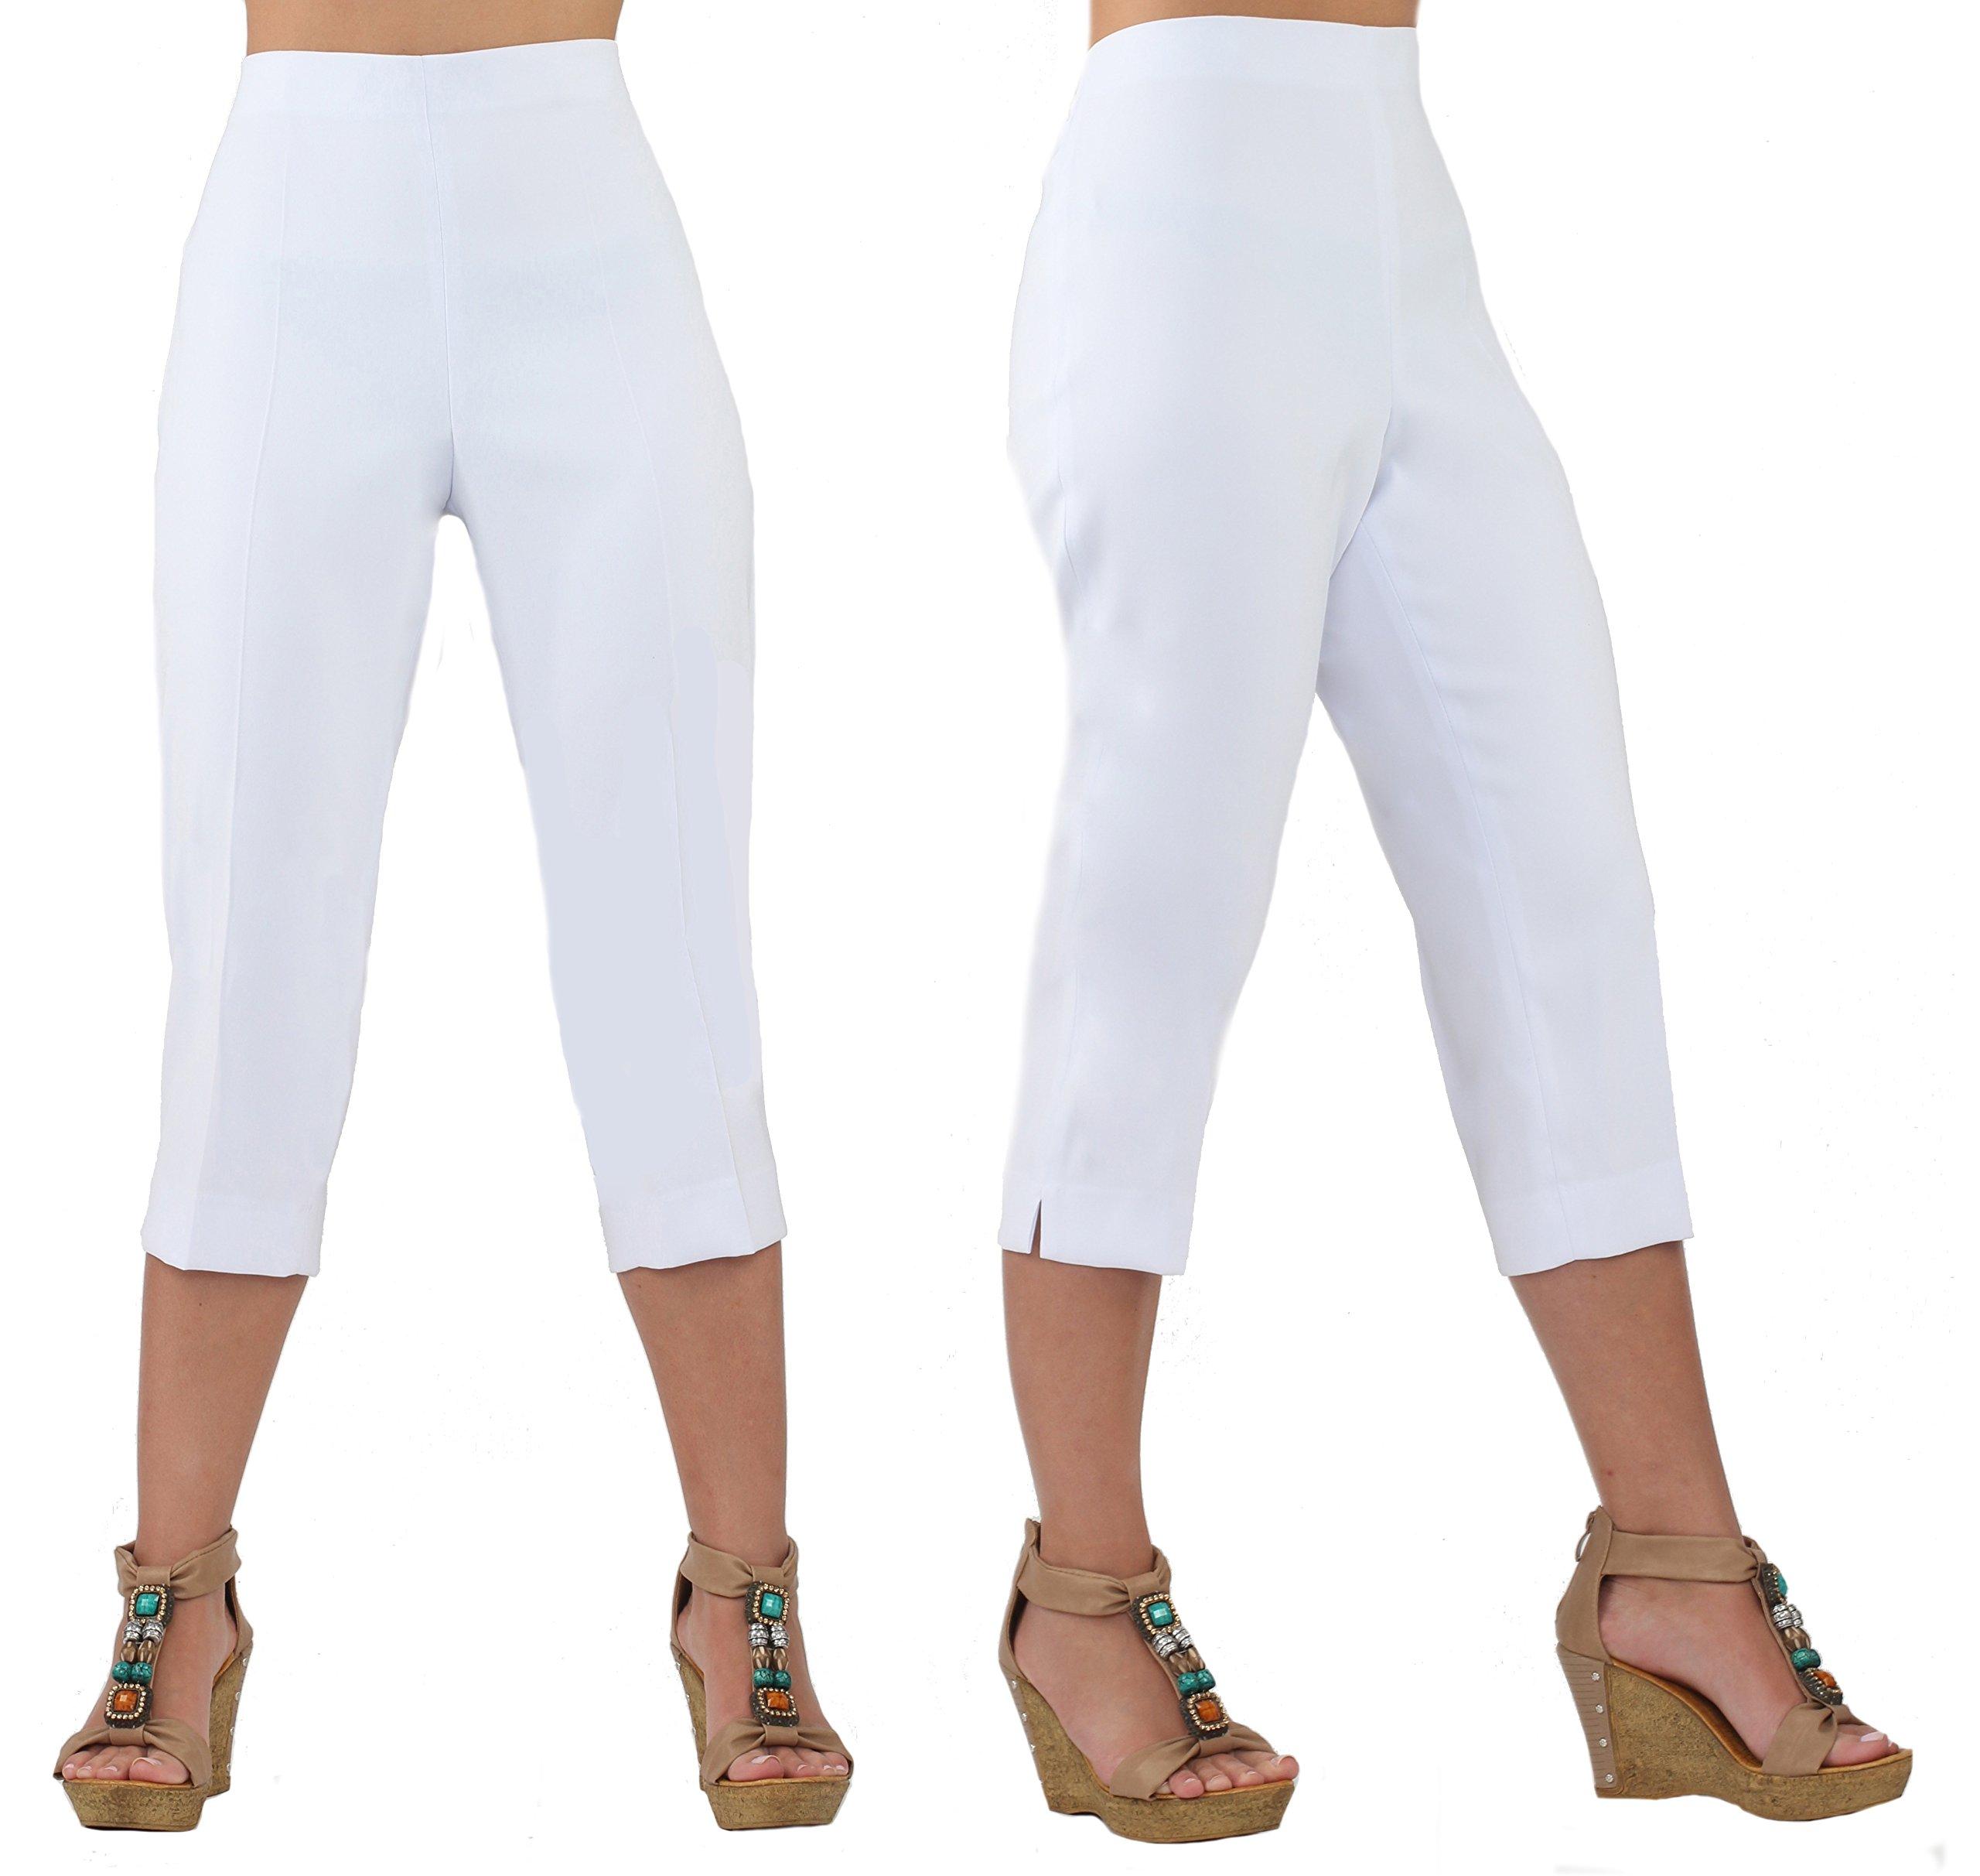 Lior Paris Women's ROXY Stylish Capri pant with a flattering Straight leg fit (5,White)